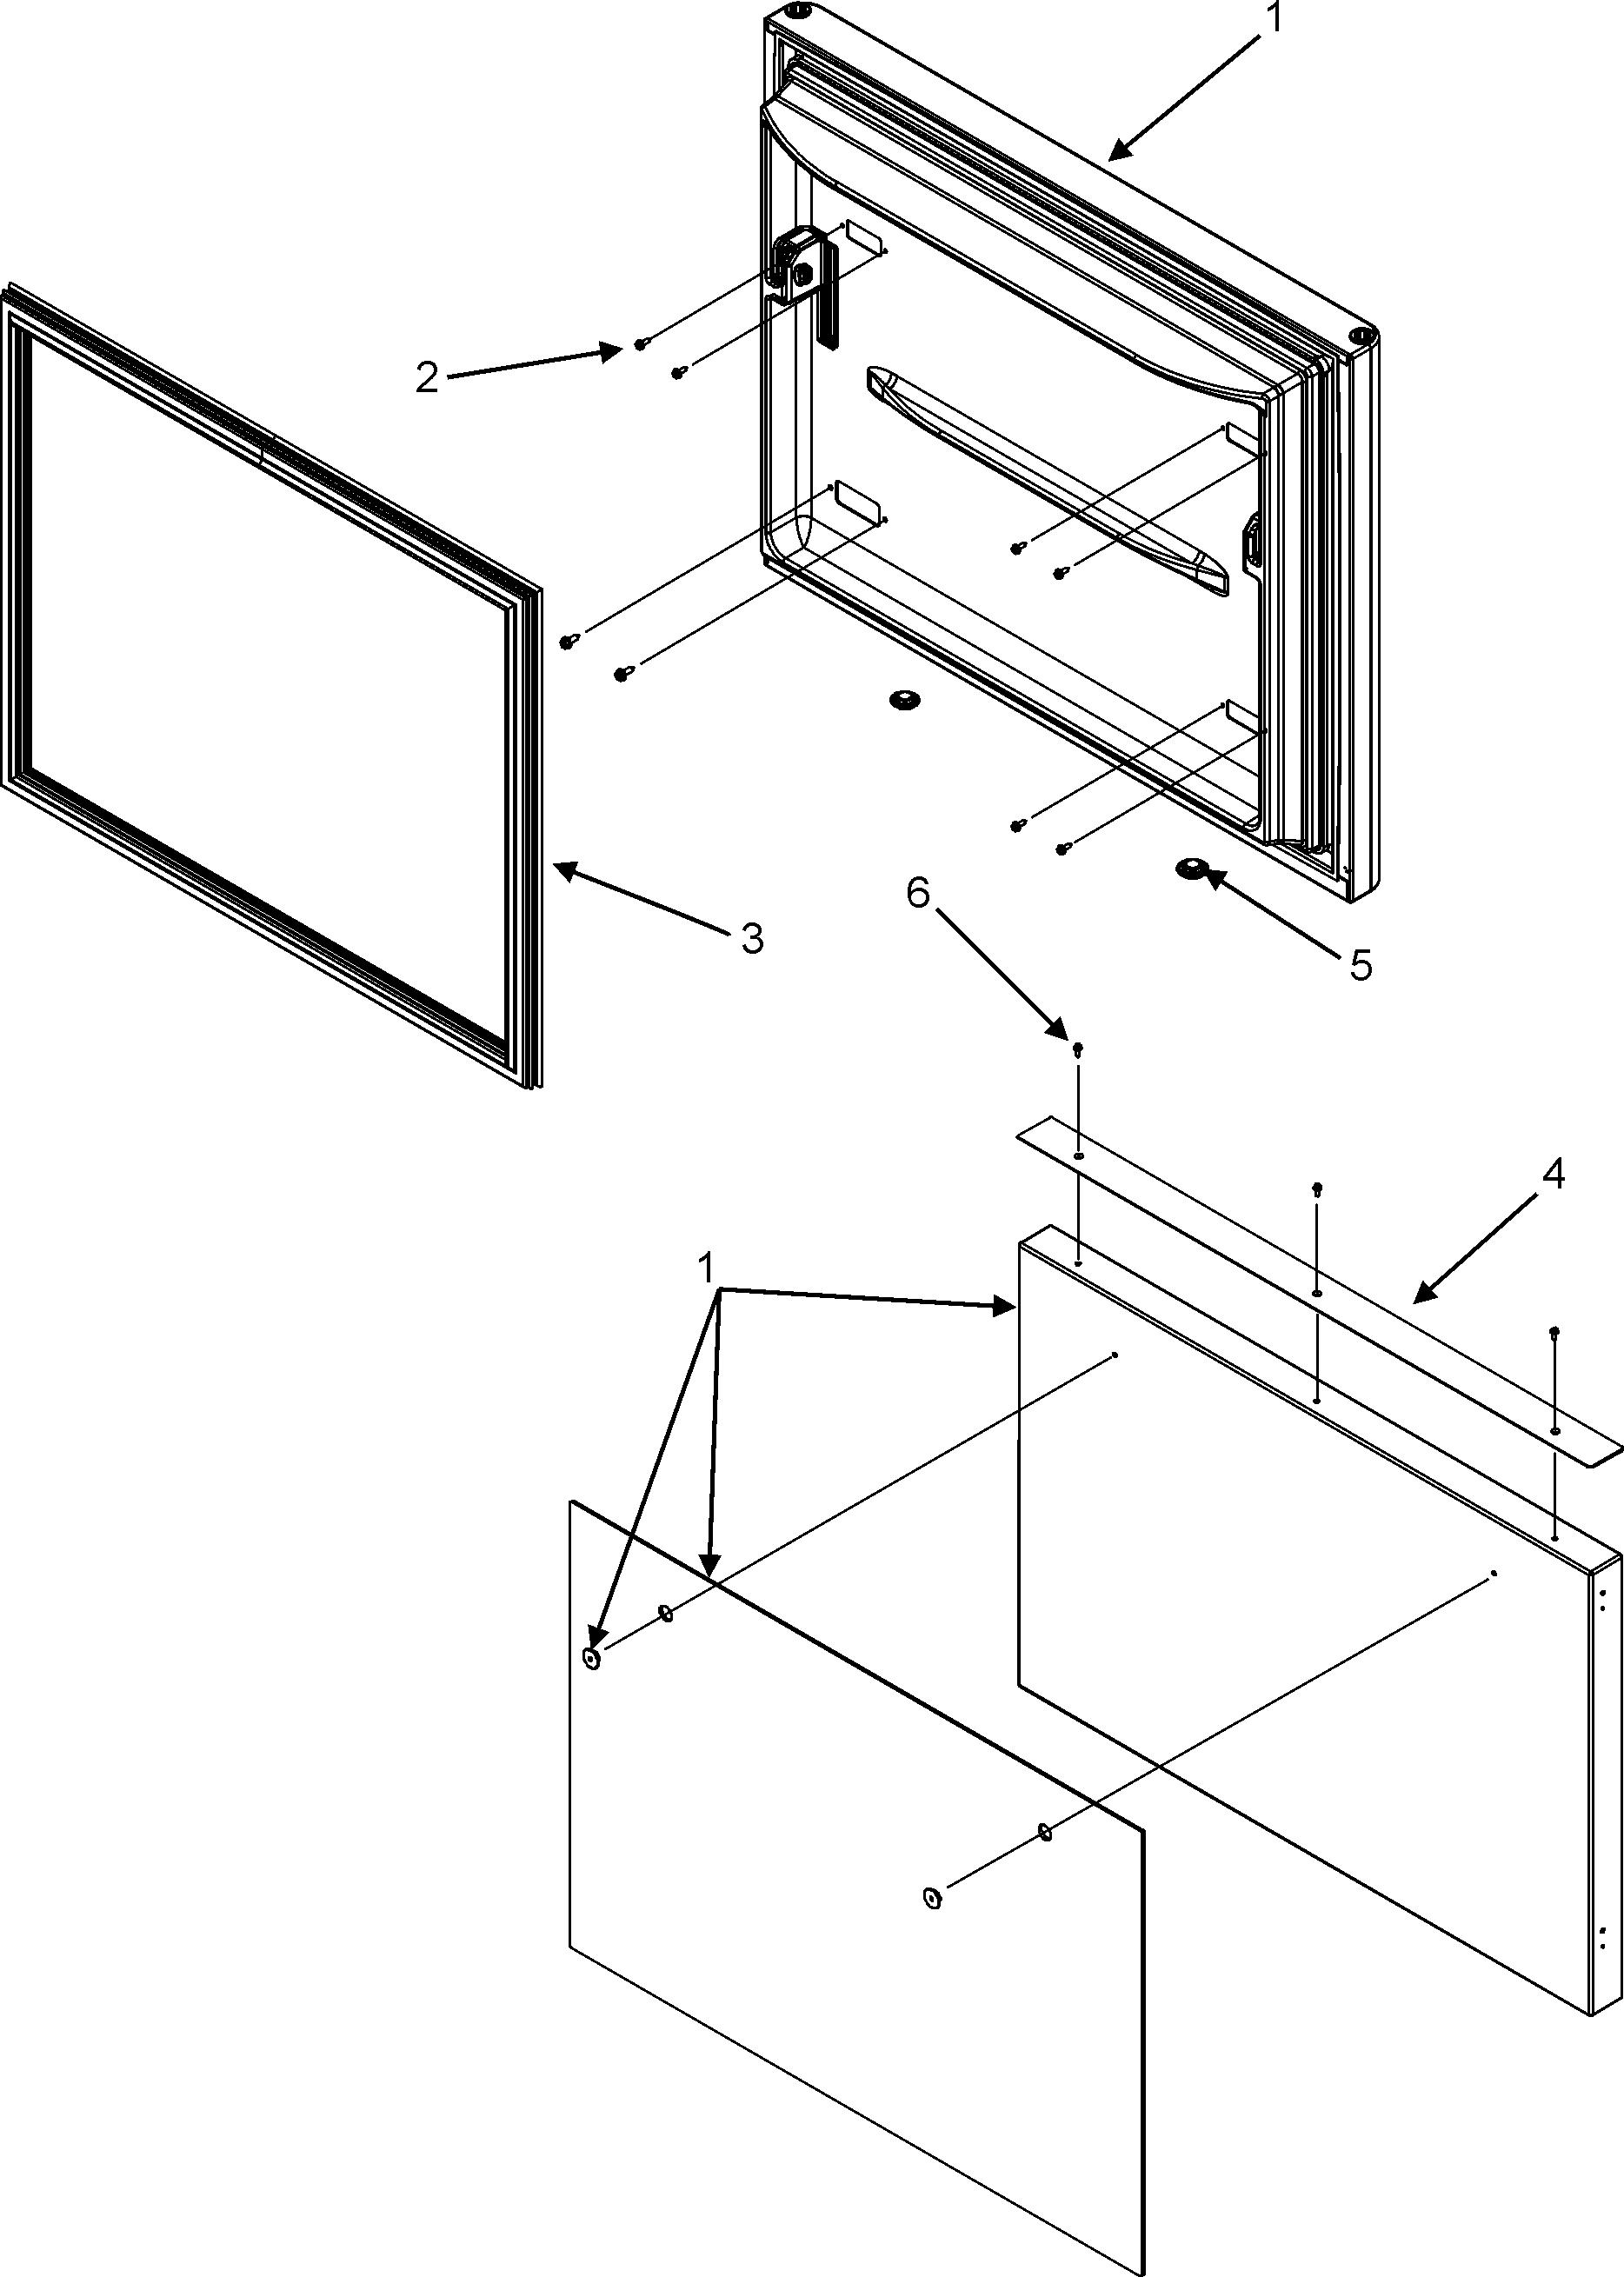 Jenn-Air model JFC2089HPY bottom-mount refrigerator